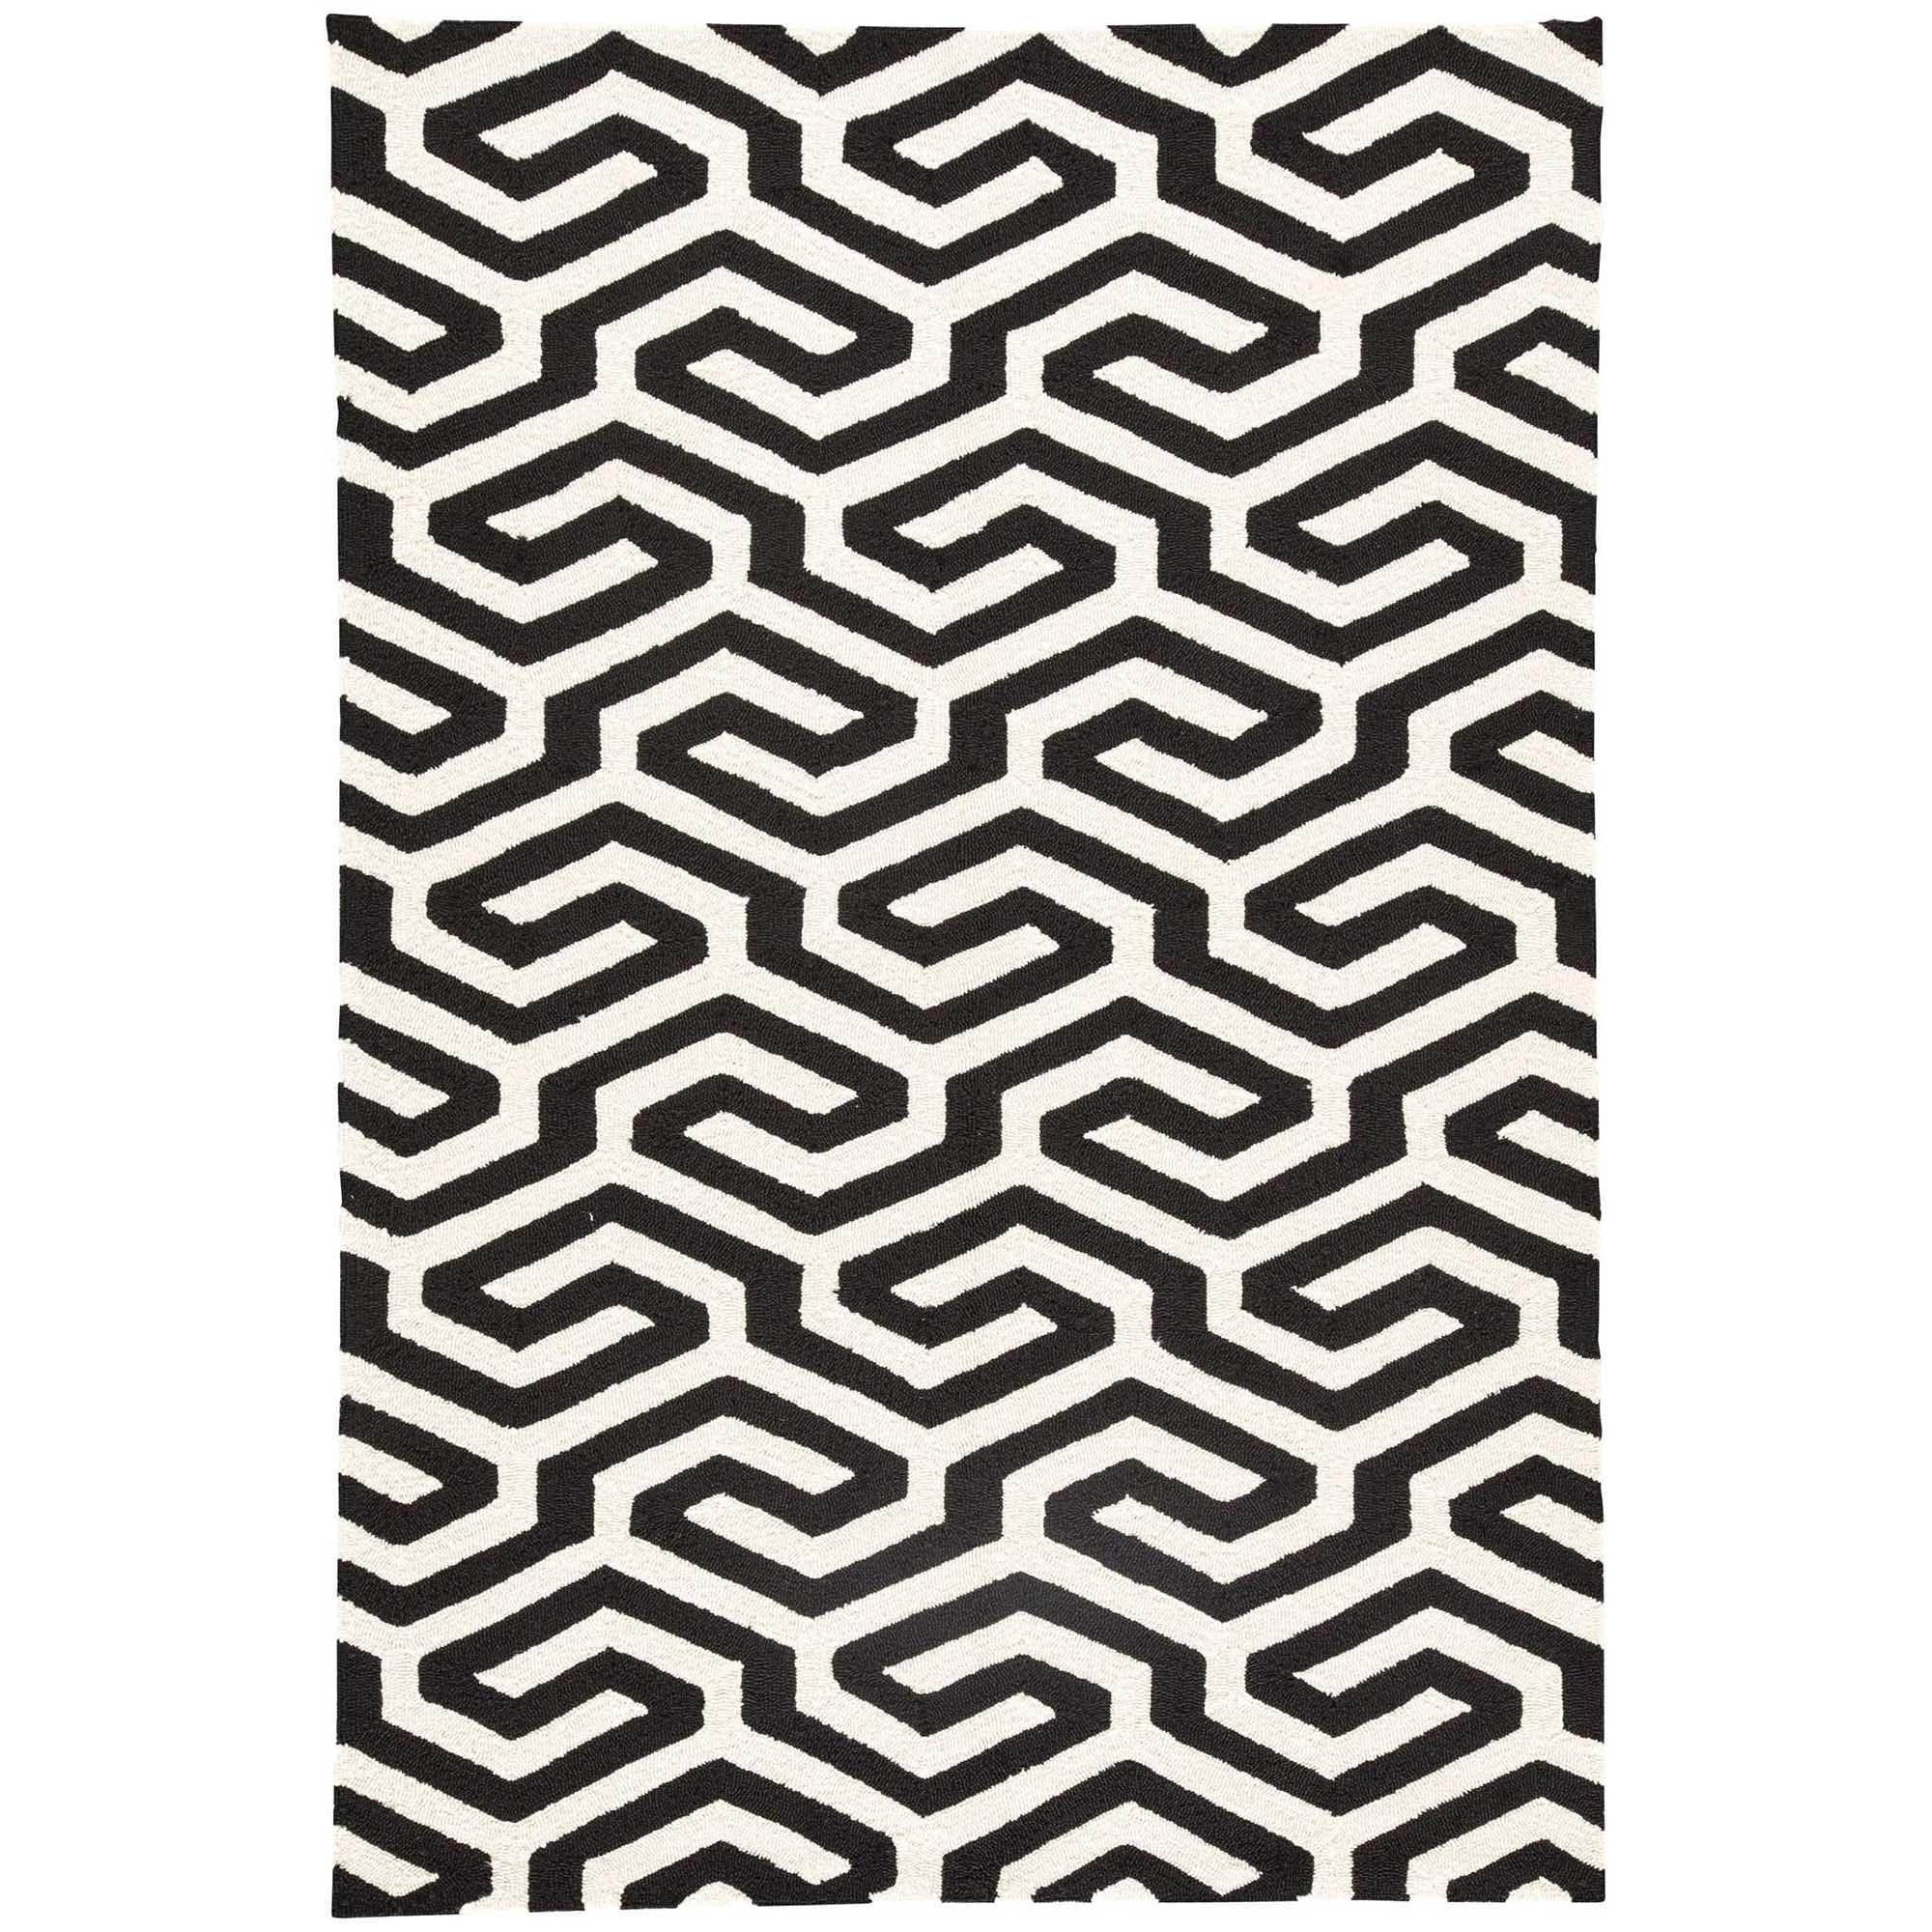 Shop Casselton Indoor Outdoor Geometric Black White Area Rug 5 X